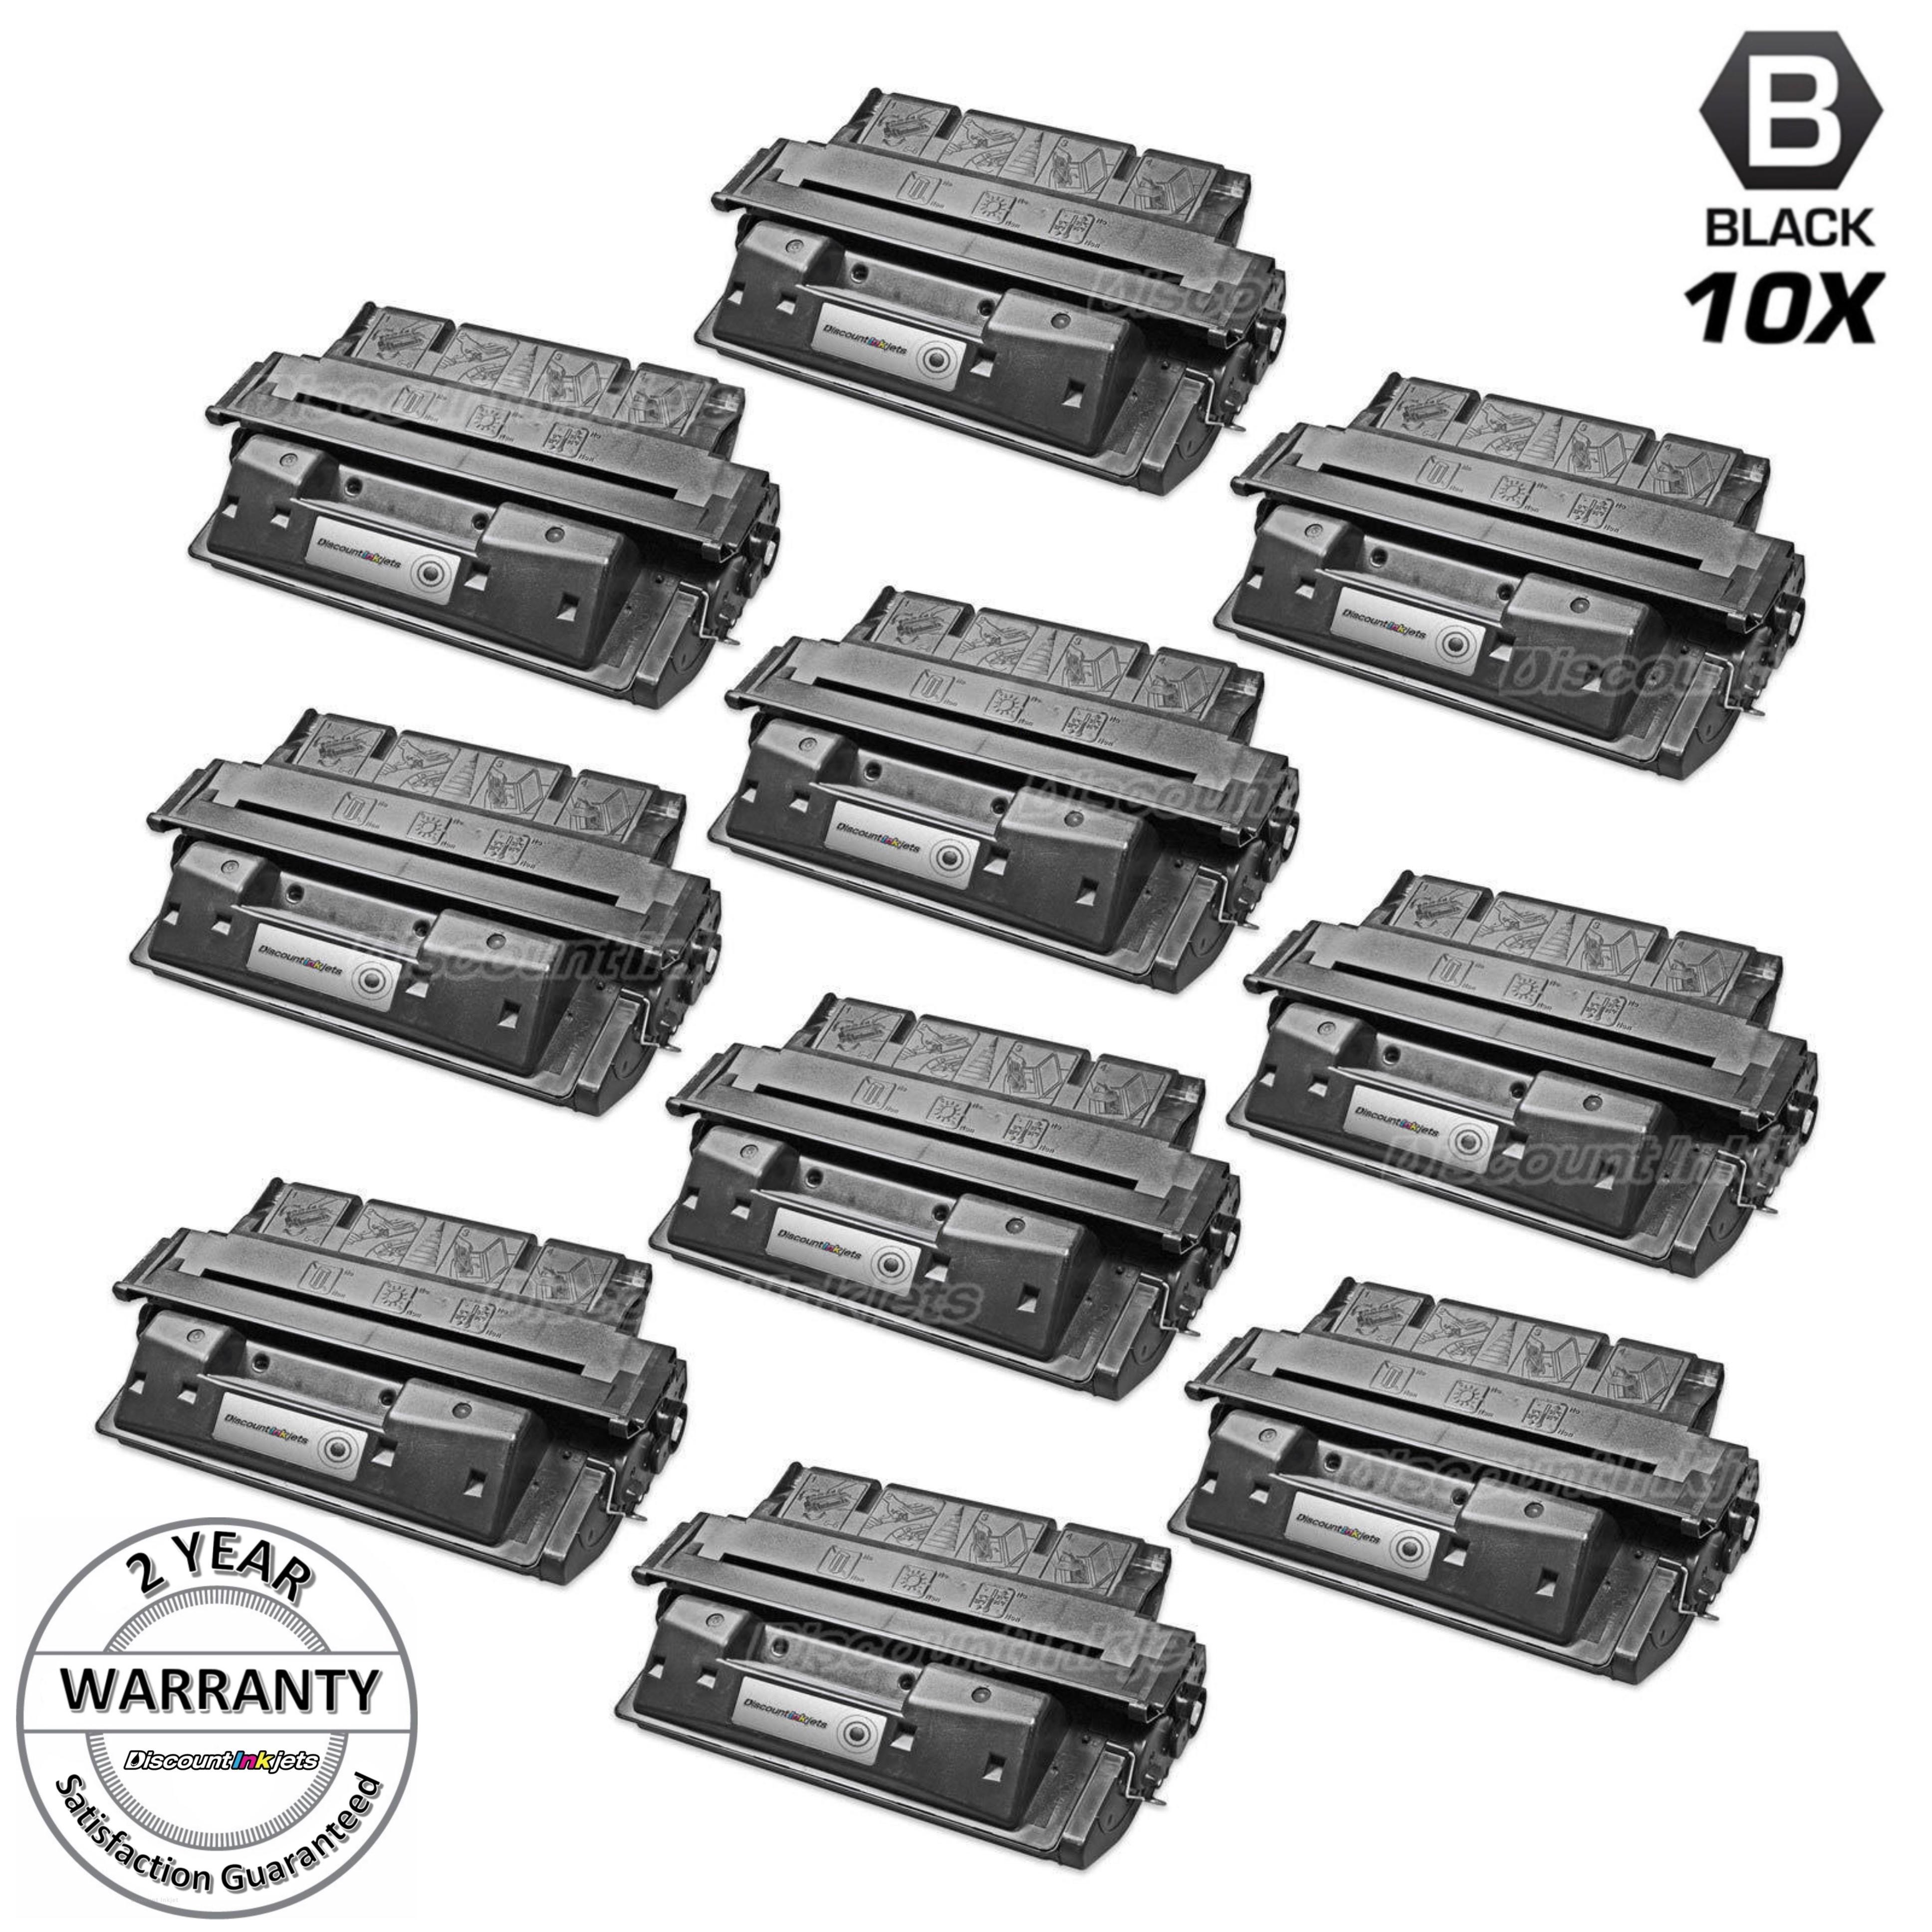 4 packs C4127X Toner Cartridge fits HP 4050se 4000t 4050tn 4050 4000 Printer